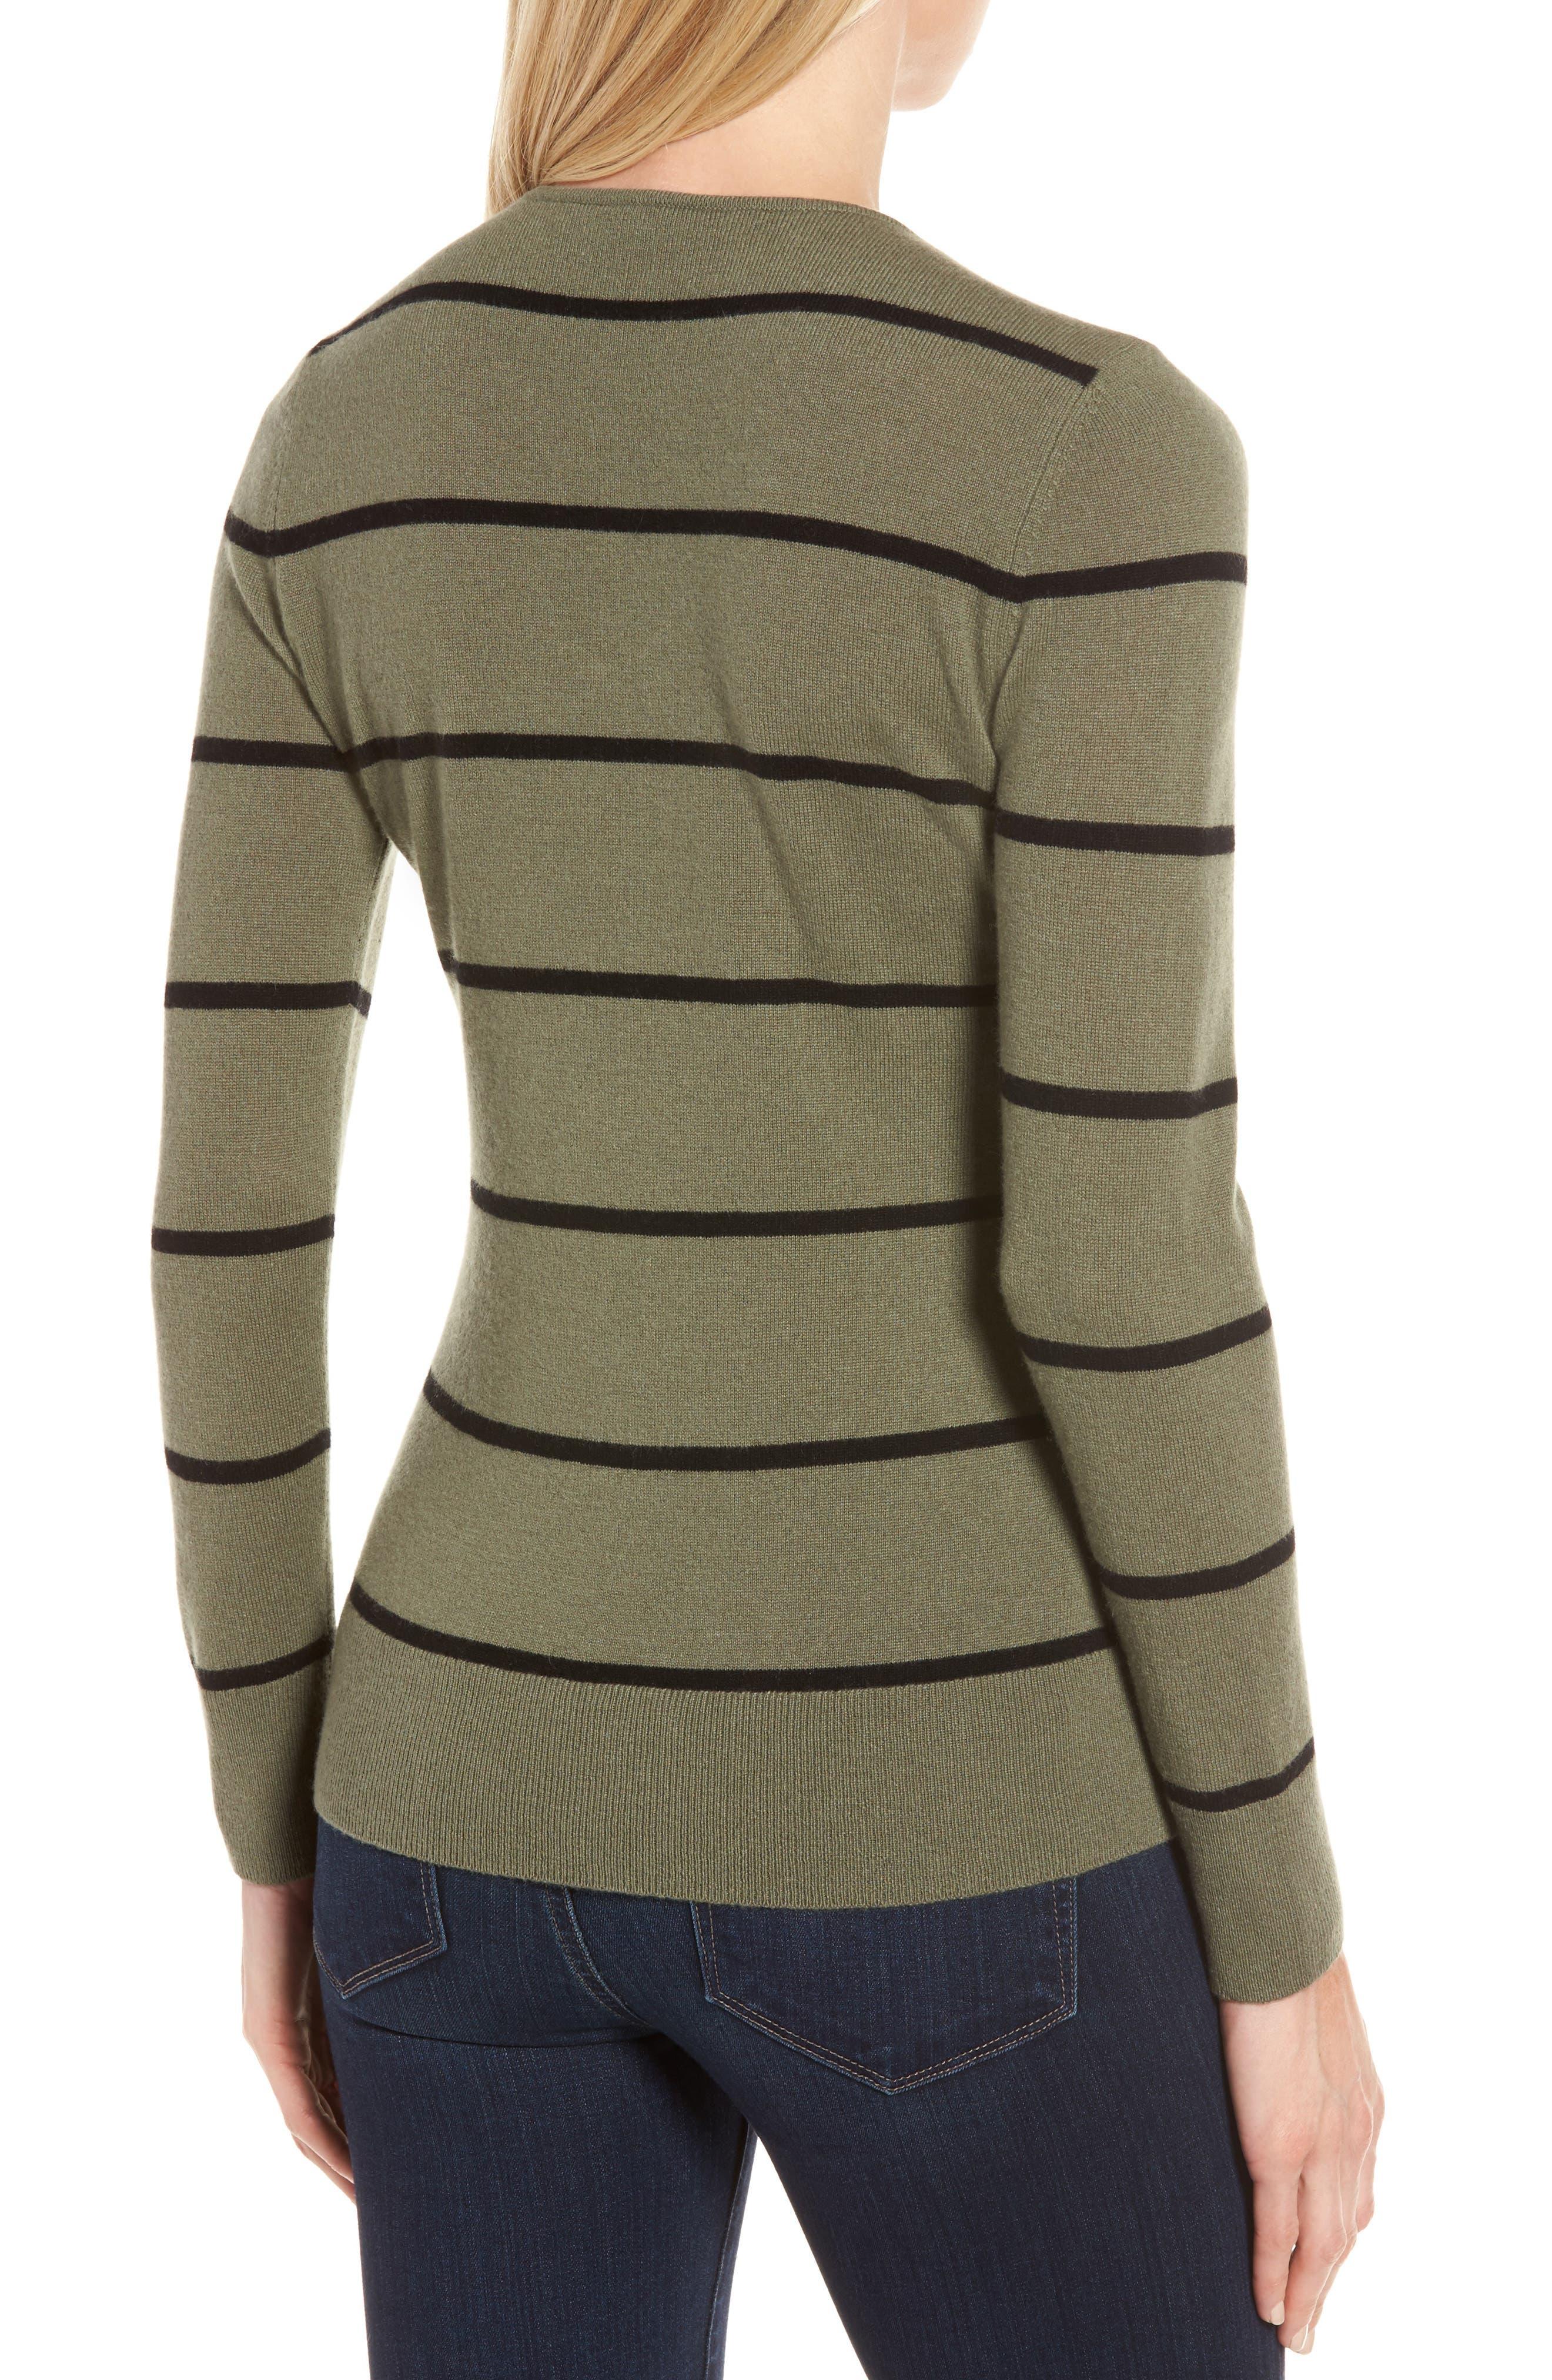 Stripe Cashmere Sweater,                             Alternate thumbnail 2, color,                             315